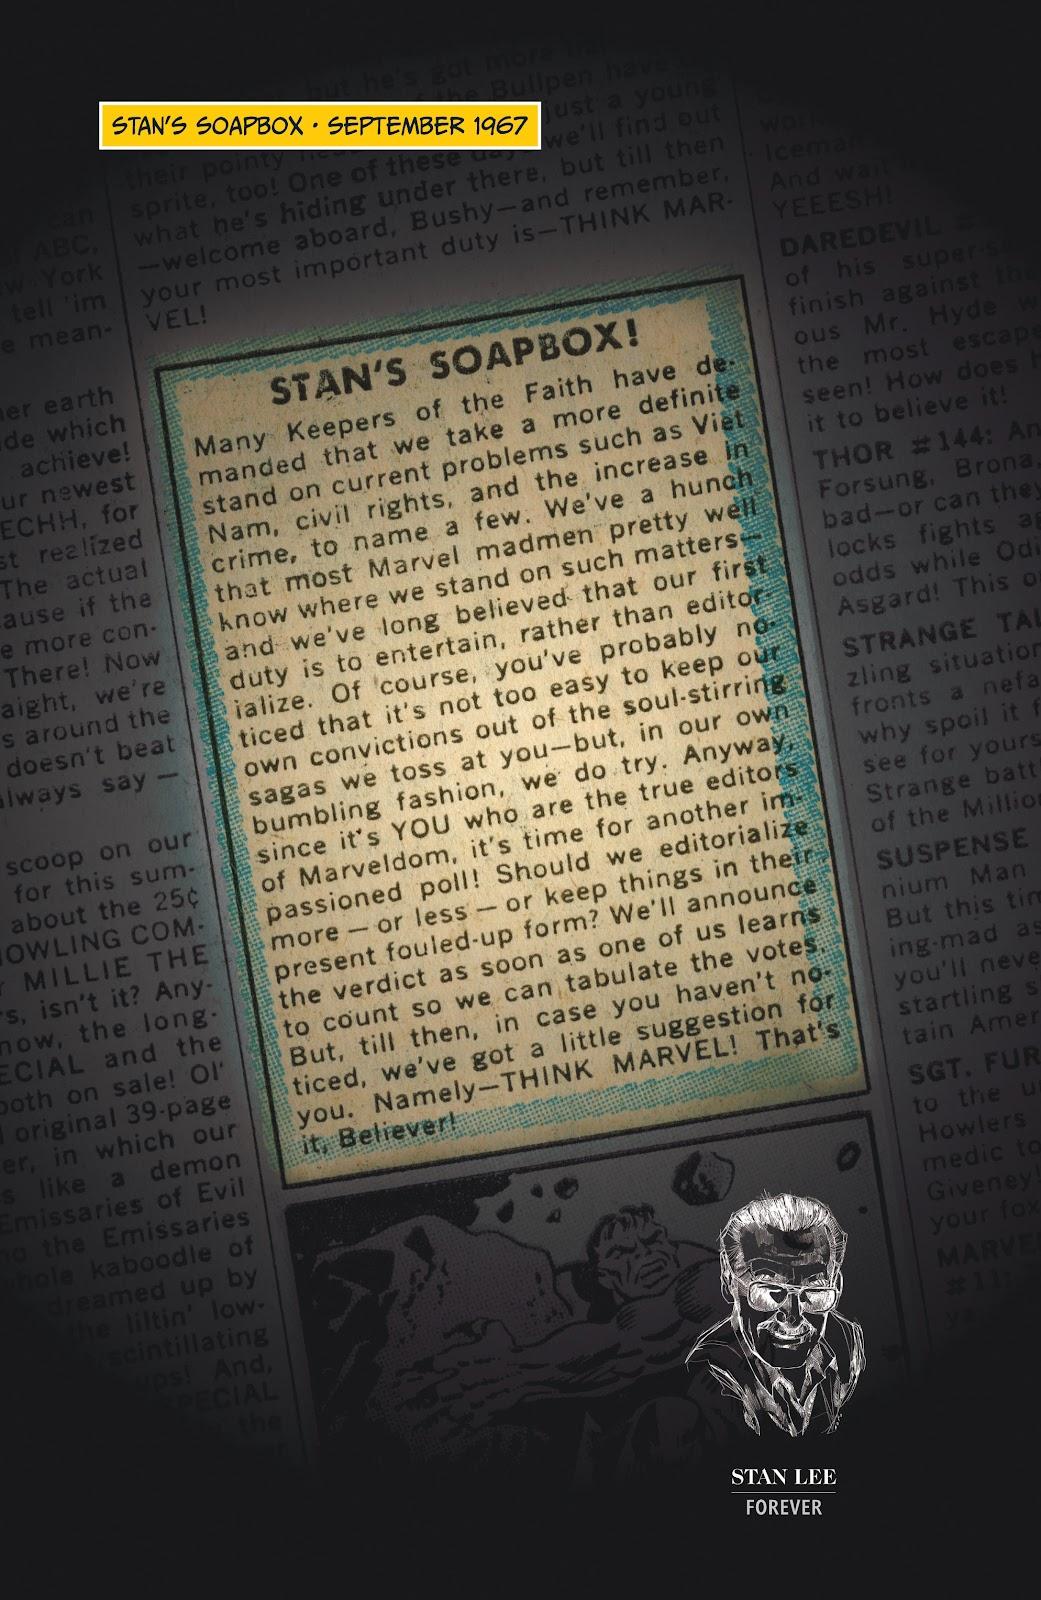 Read online Spider-Man/Deadpool comic -  Issue #48 - 18